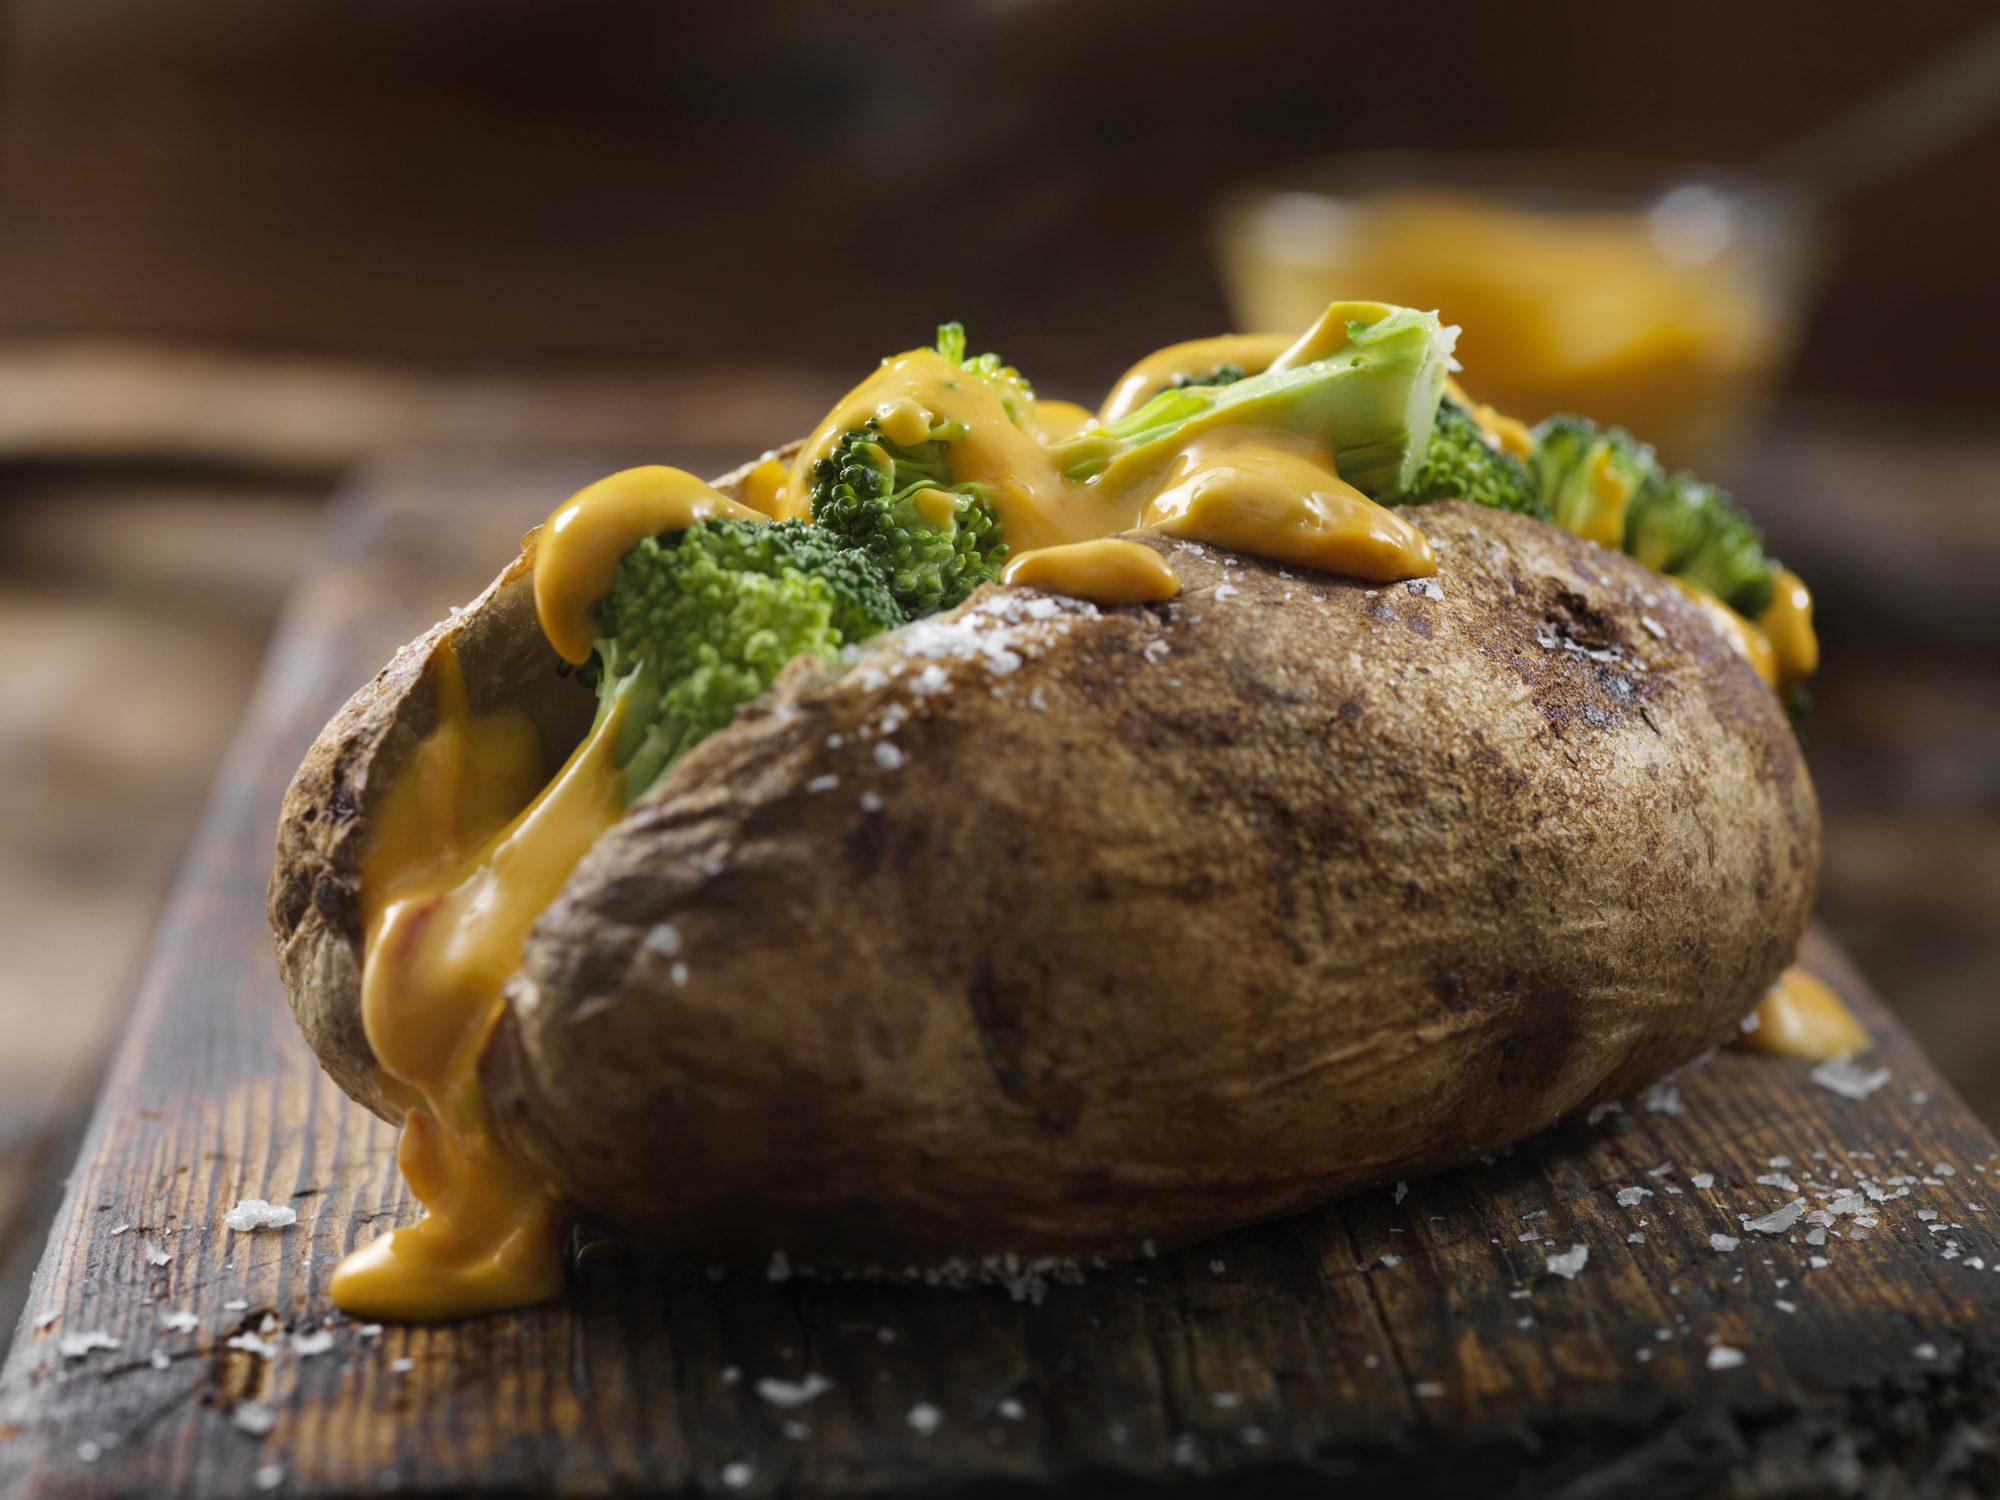 jacket-potato-cosa-mangiare-londra